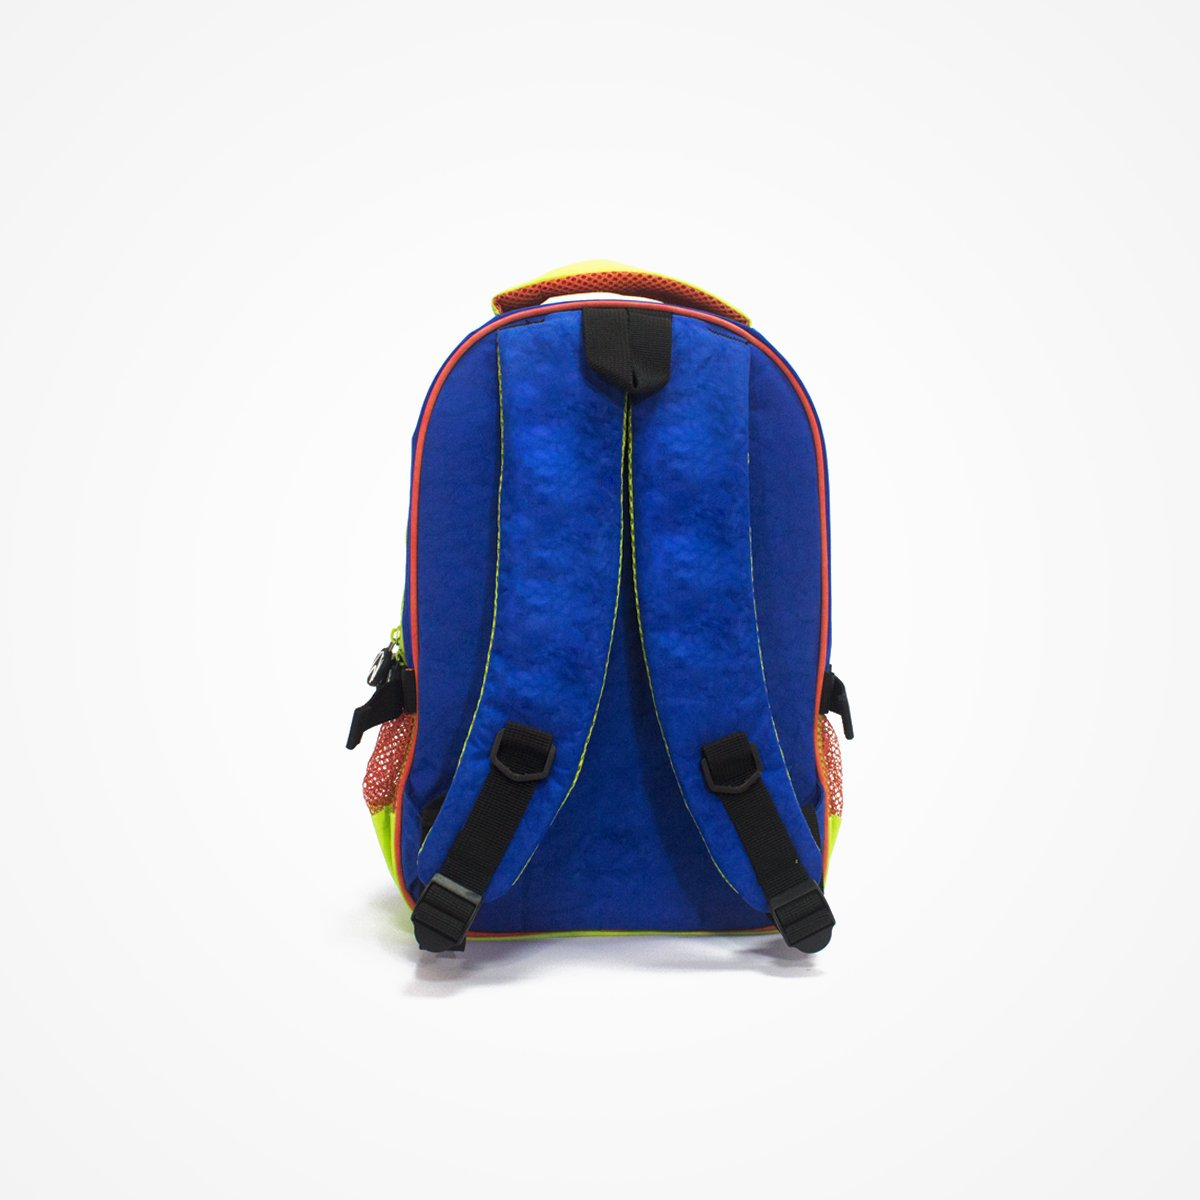 Multi-Colored Shark Biglove Small Kids Backpack